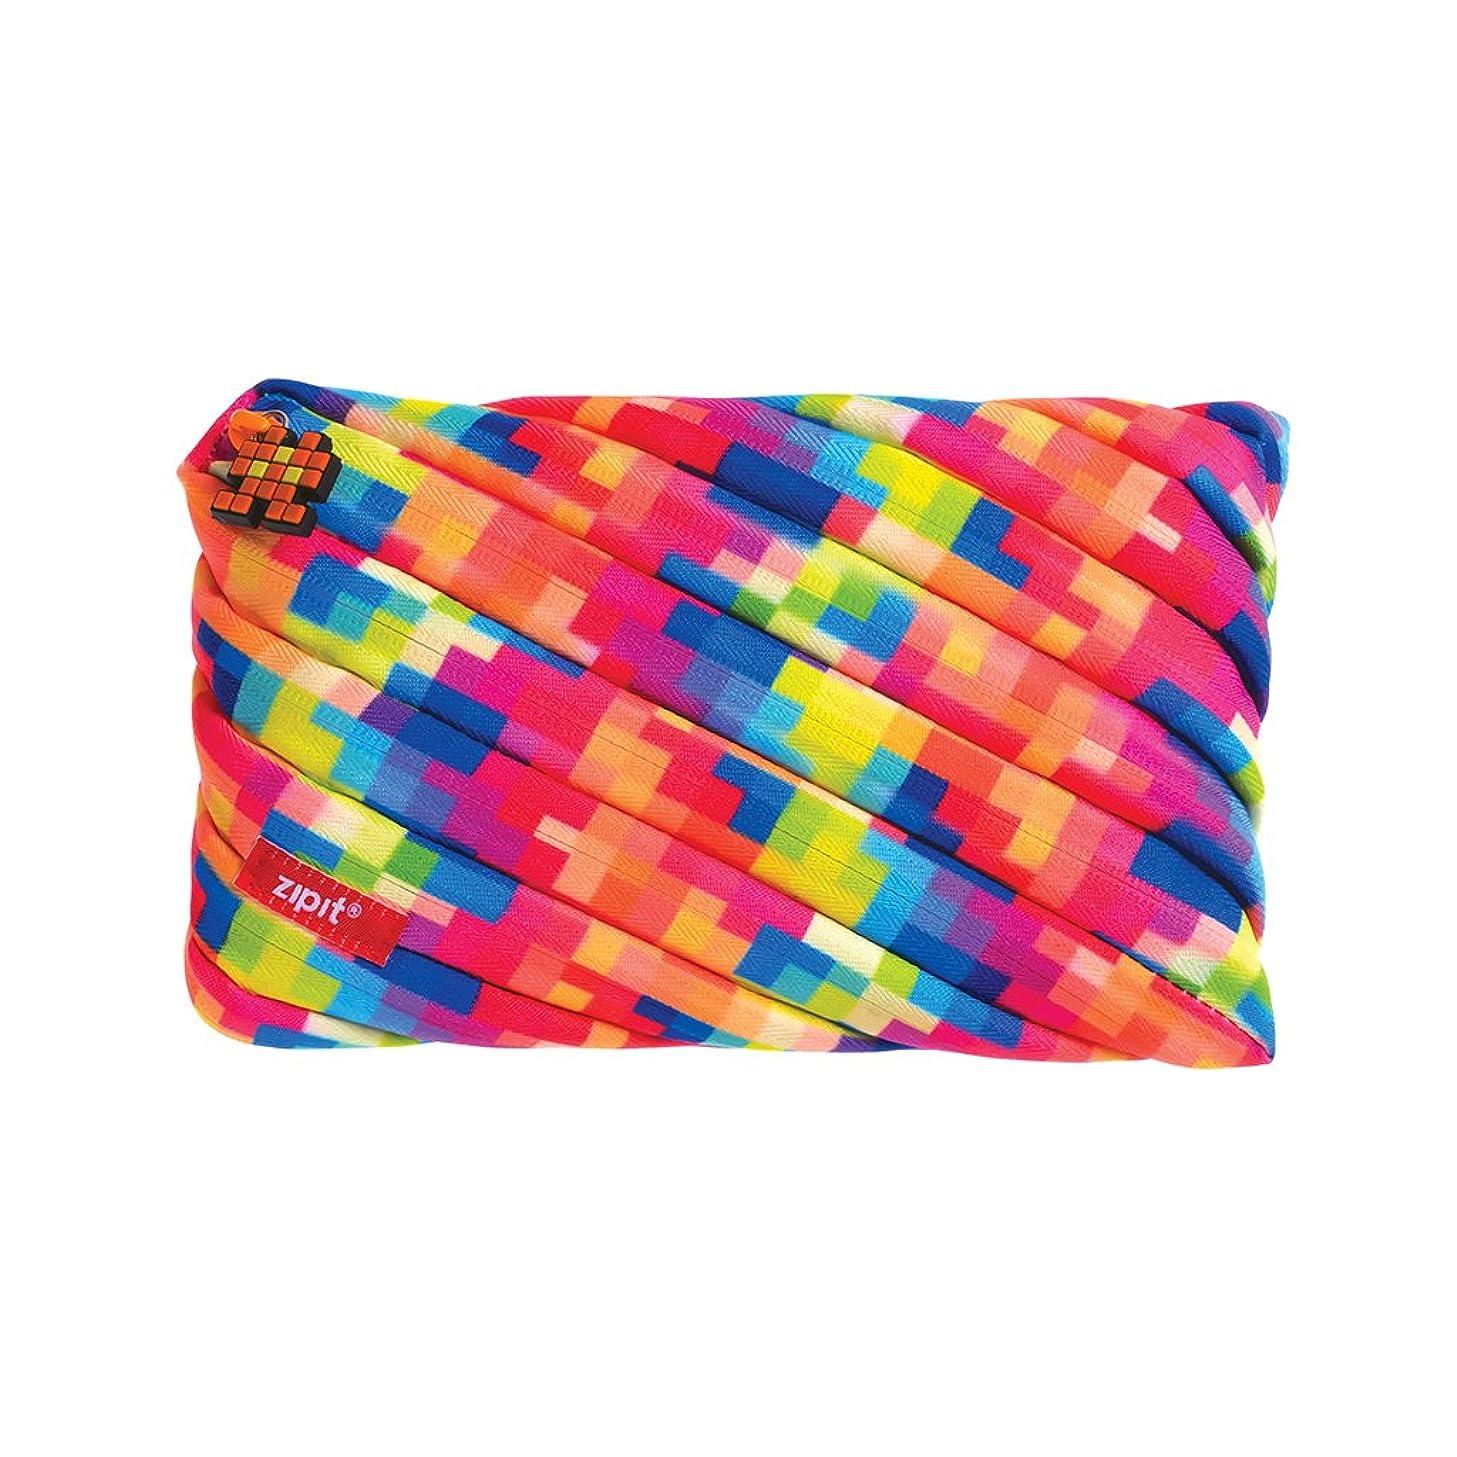 ZIPIT Pixel Big Pencil Case/Cosmetic Makeup Bag, Yellow